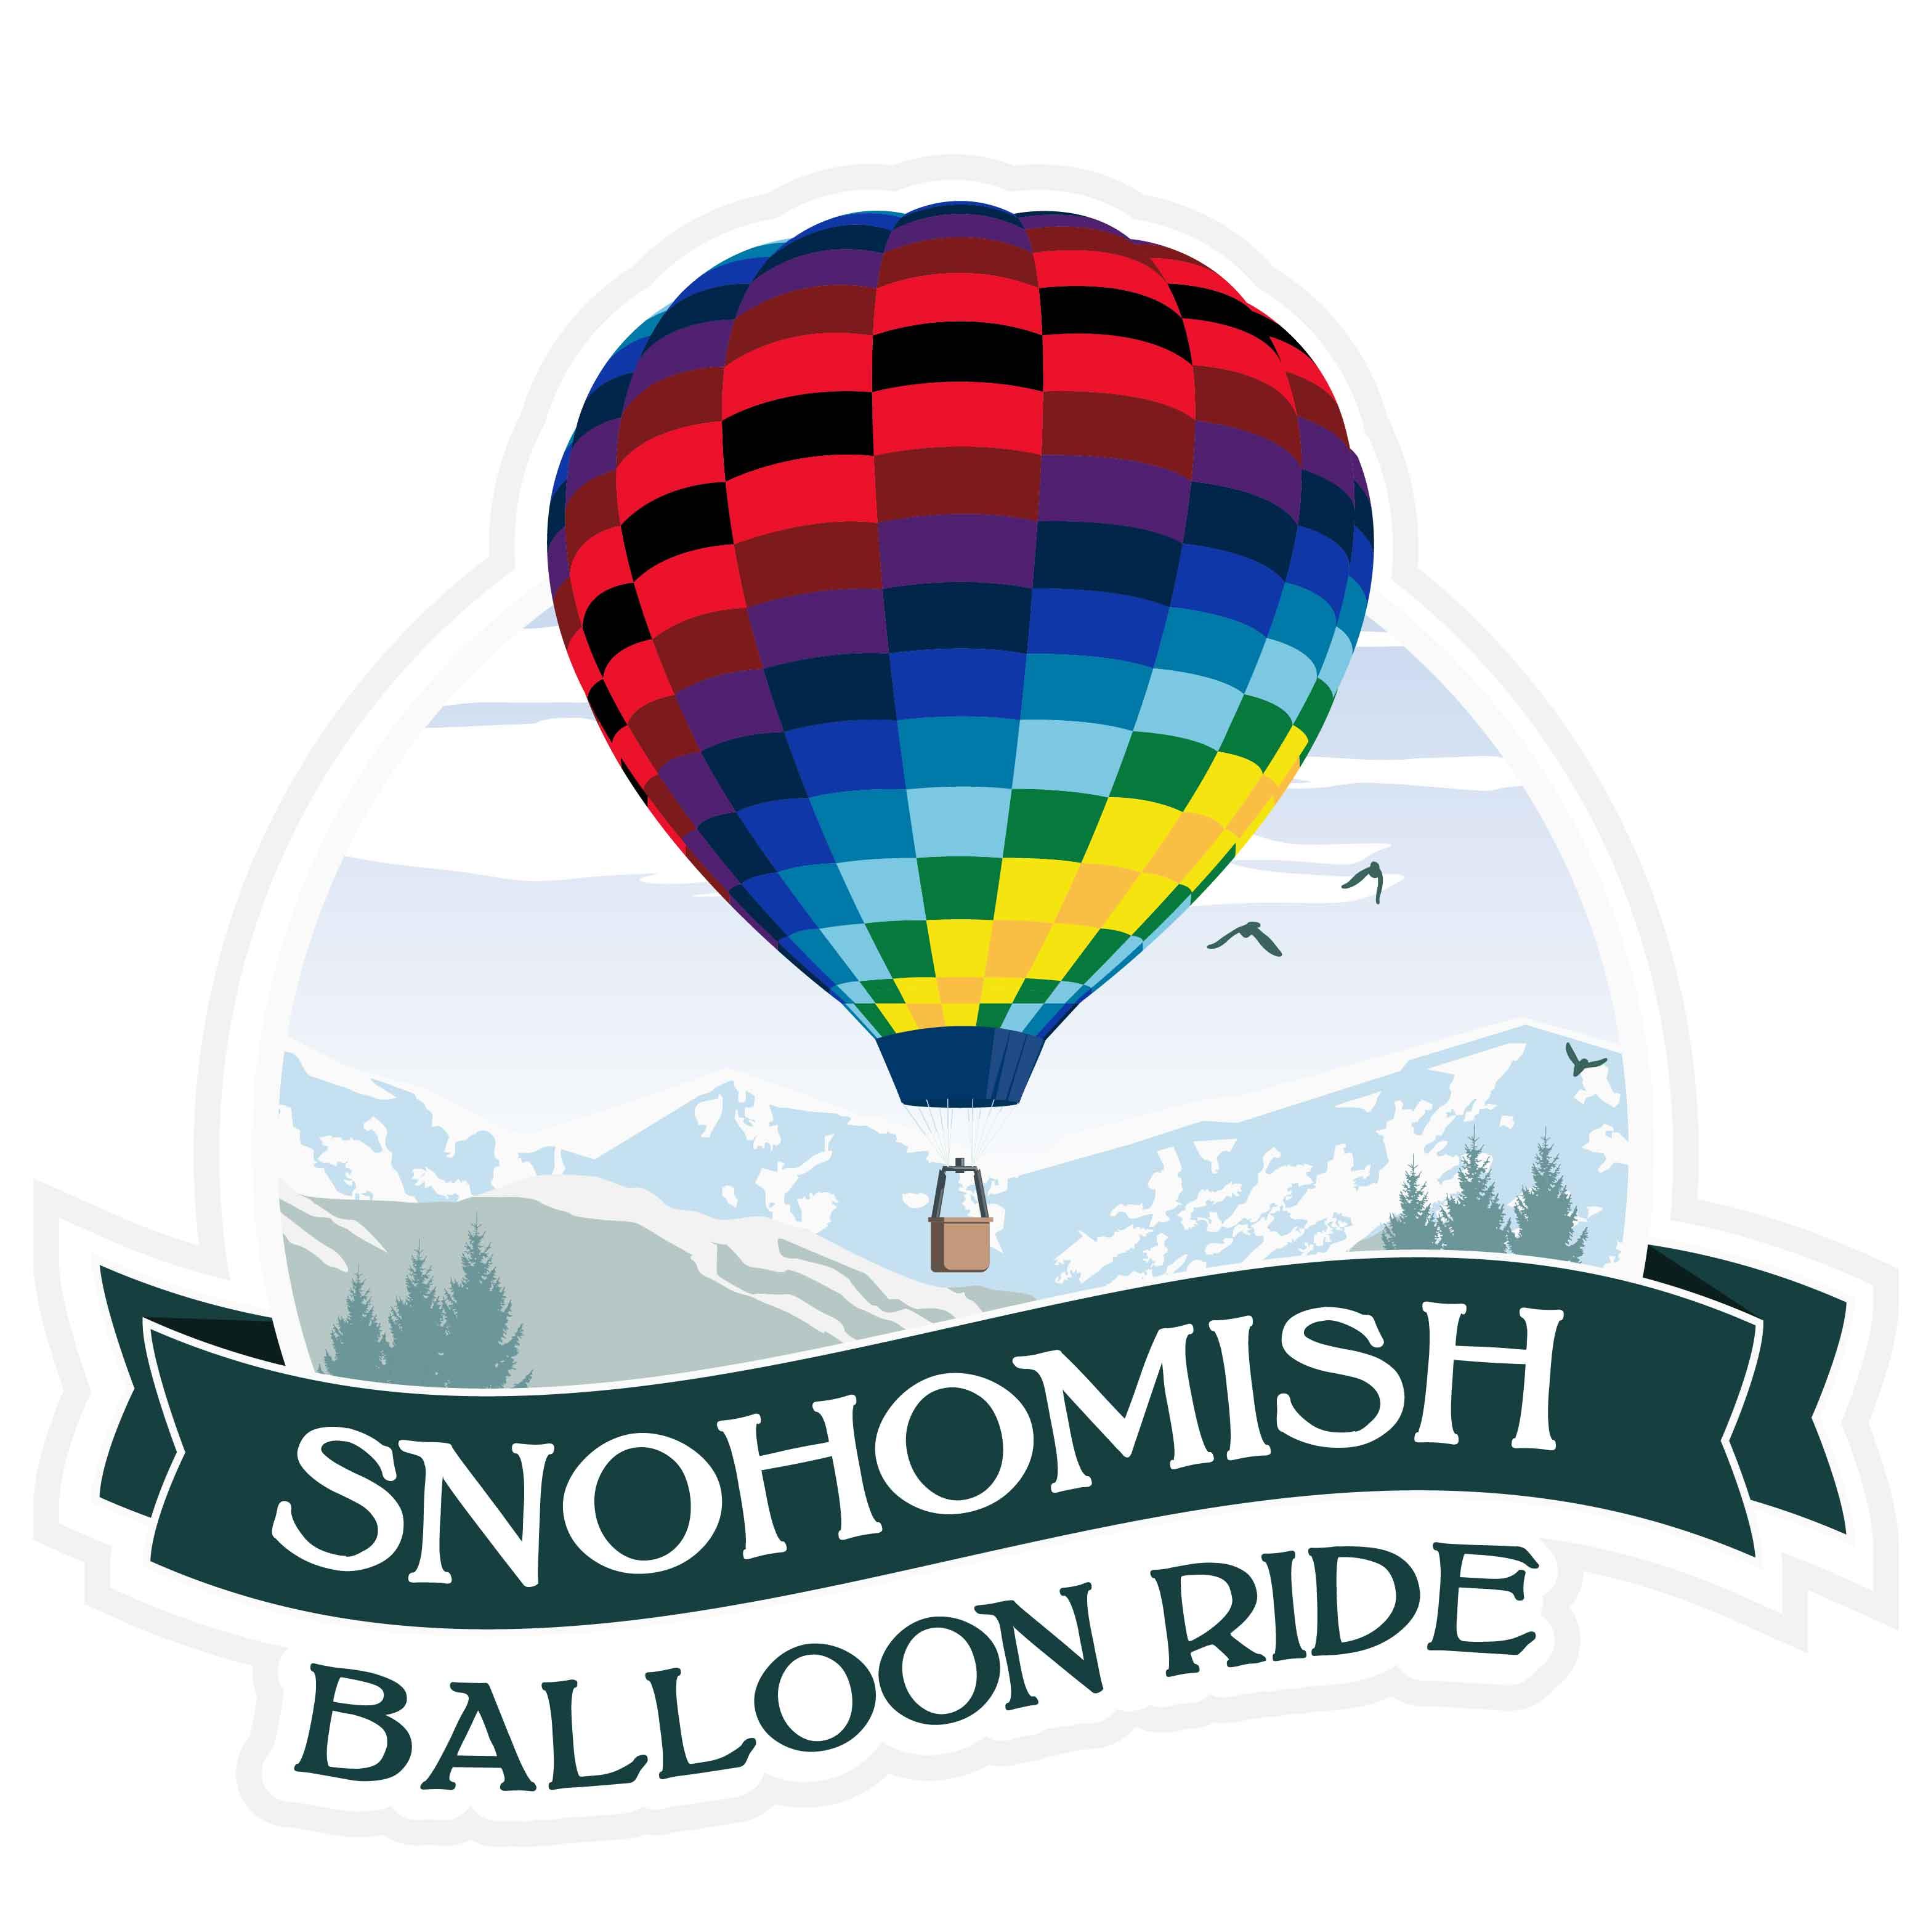 Snohomish Balloon Rides winthrop wa balloon roundup hot air balloon